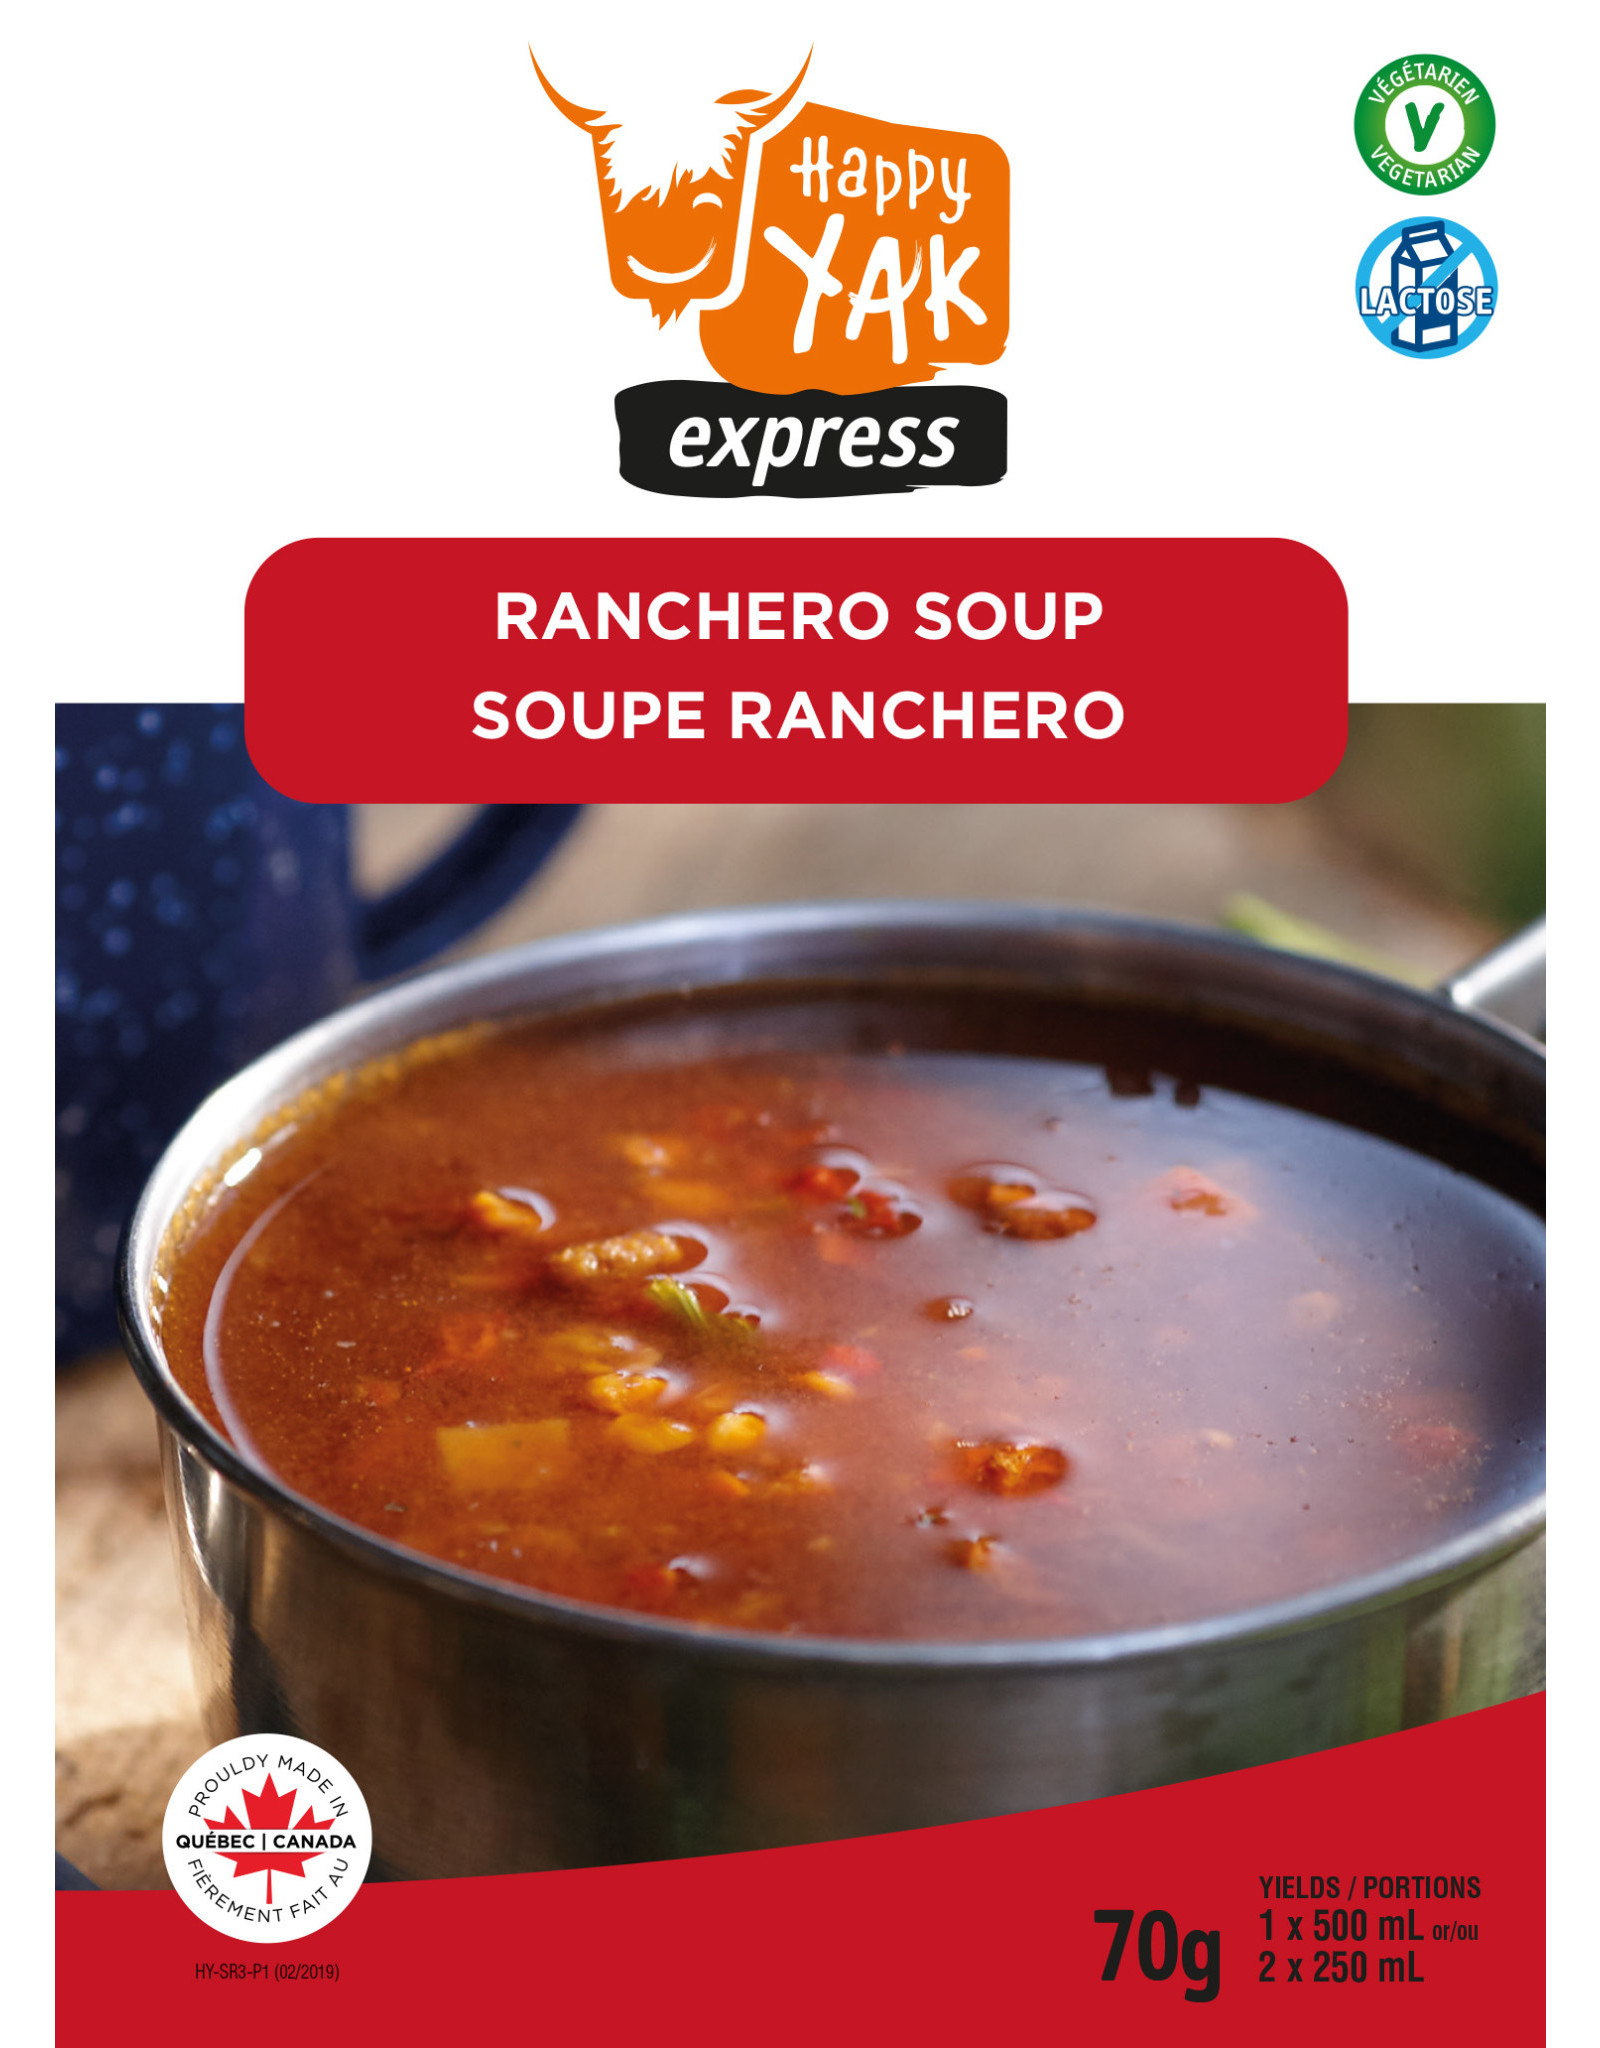 Happy Yak Happy Yak Ranchero Soup (Vegan, Lactose Free)